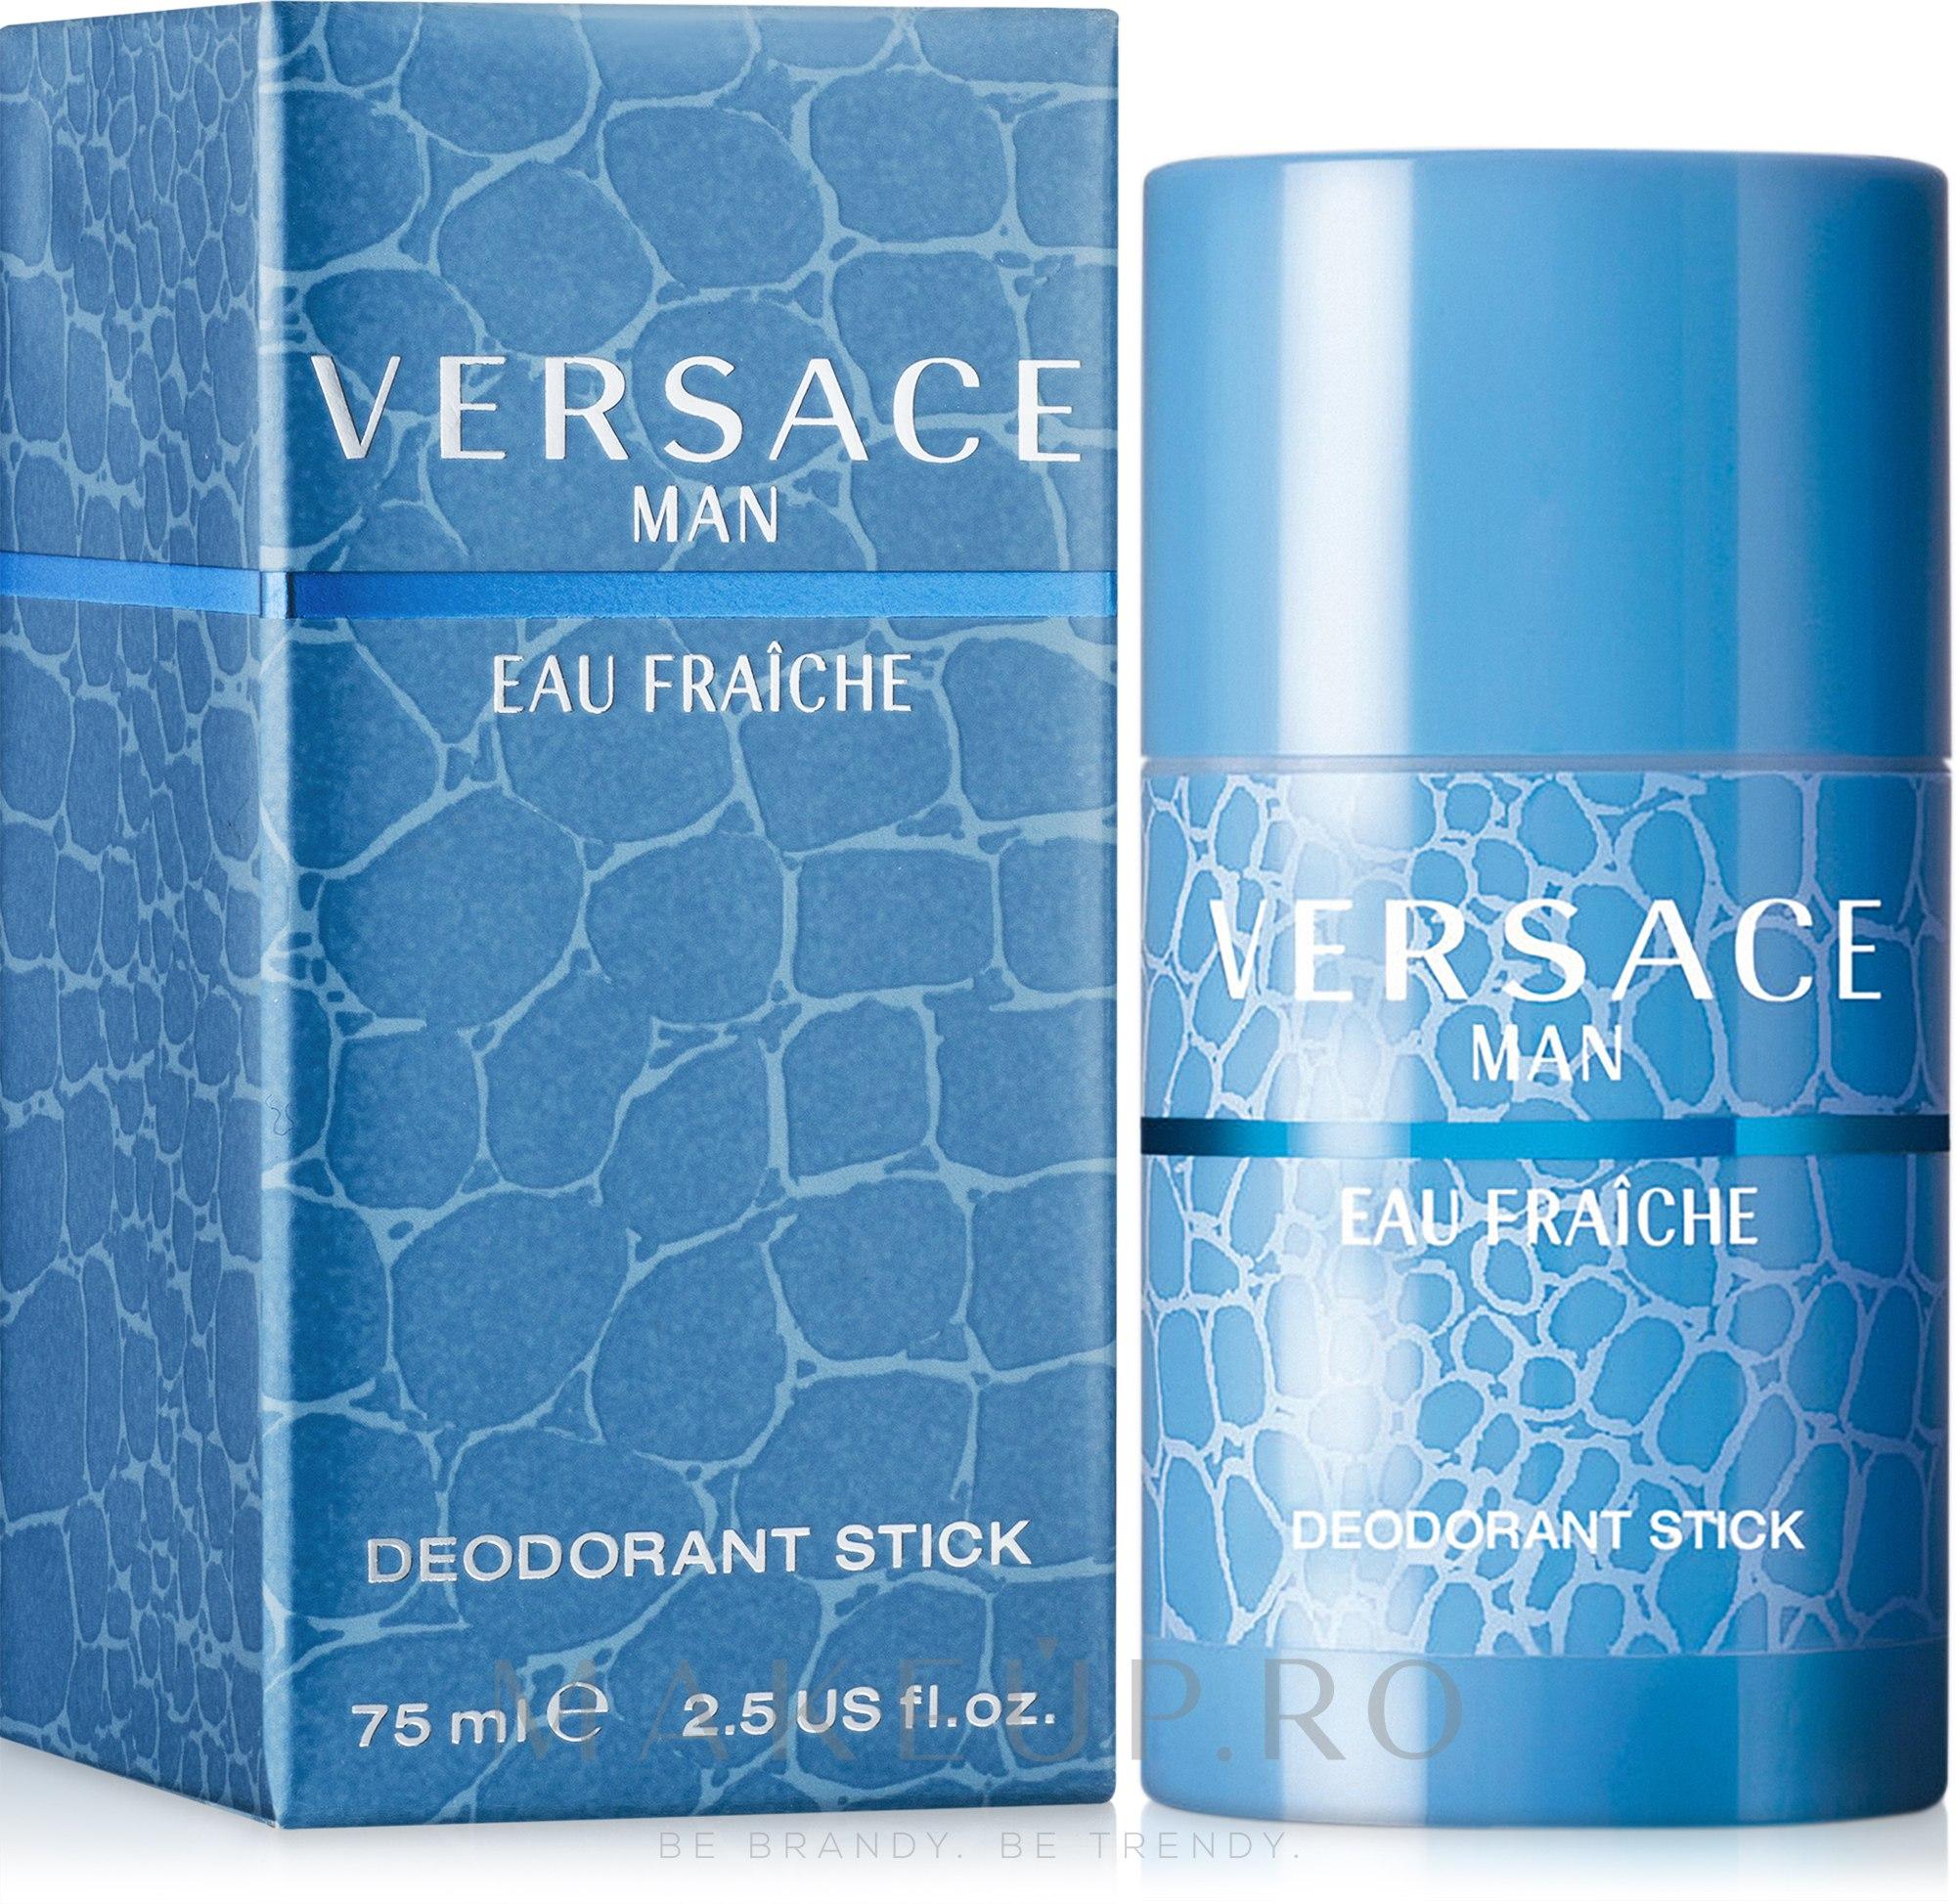 Versace Man Eau Fraiche - Deodorant stick — Imagine 75 ml